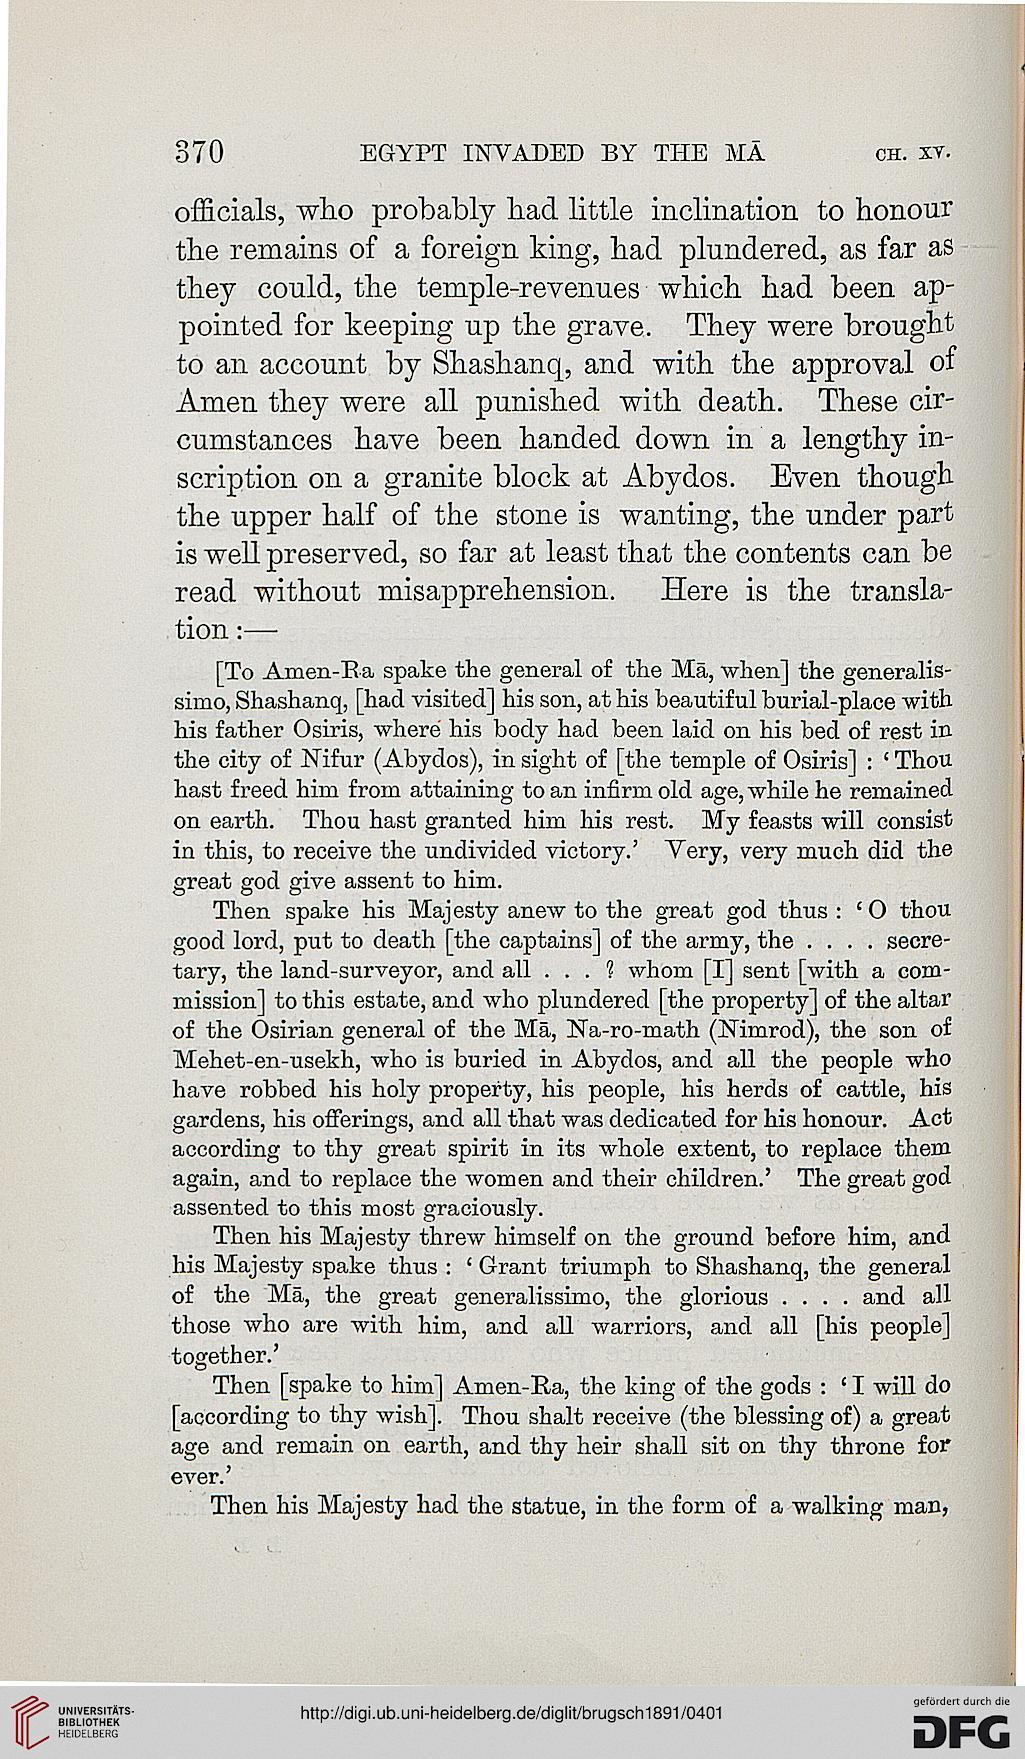 Brugsch, Heinrich: Egypt under the pharaohs: a history